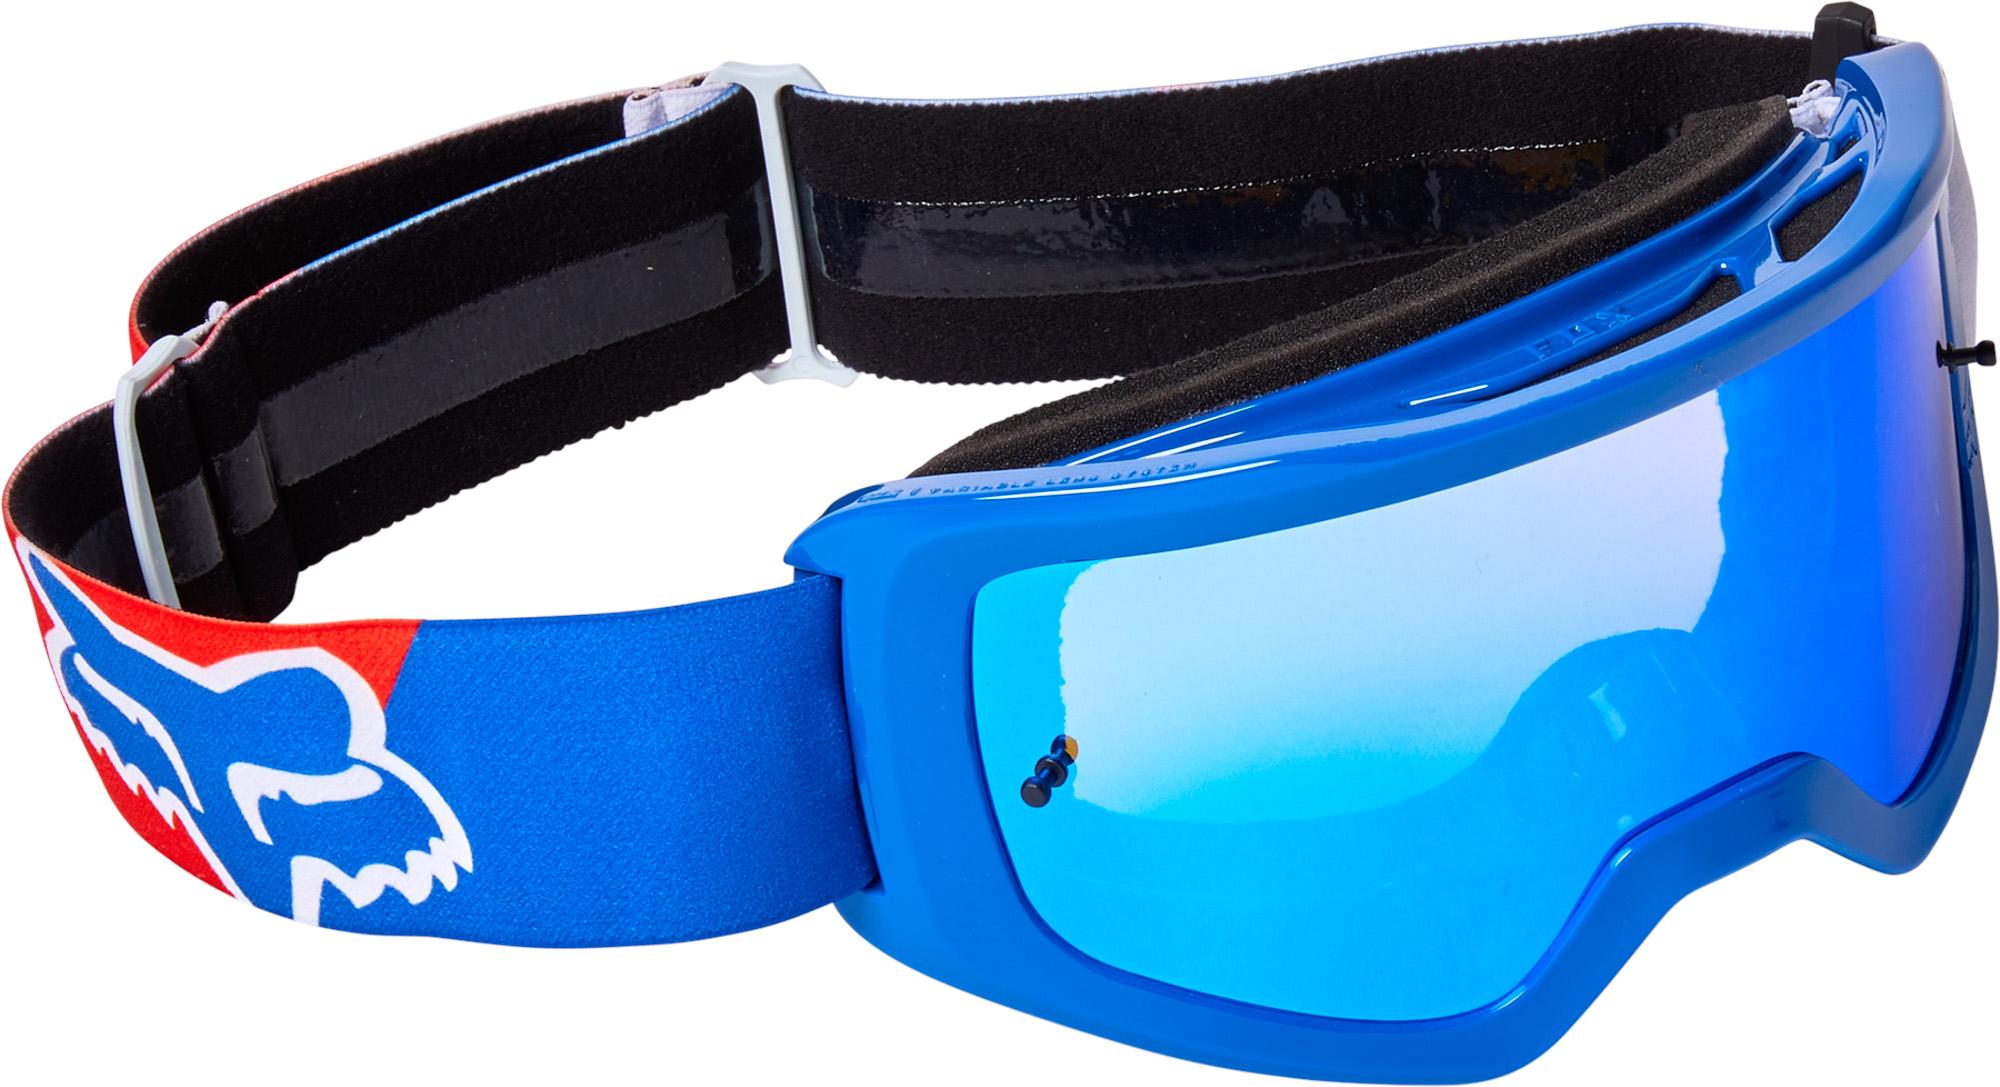 FOX Main Skew Goggle - Spark - OS, WHITE/RED/BLUE MX22